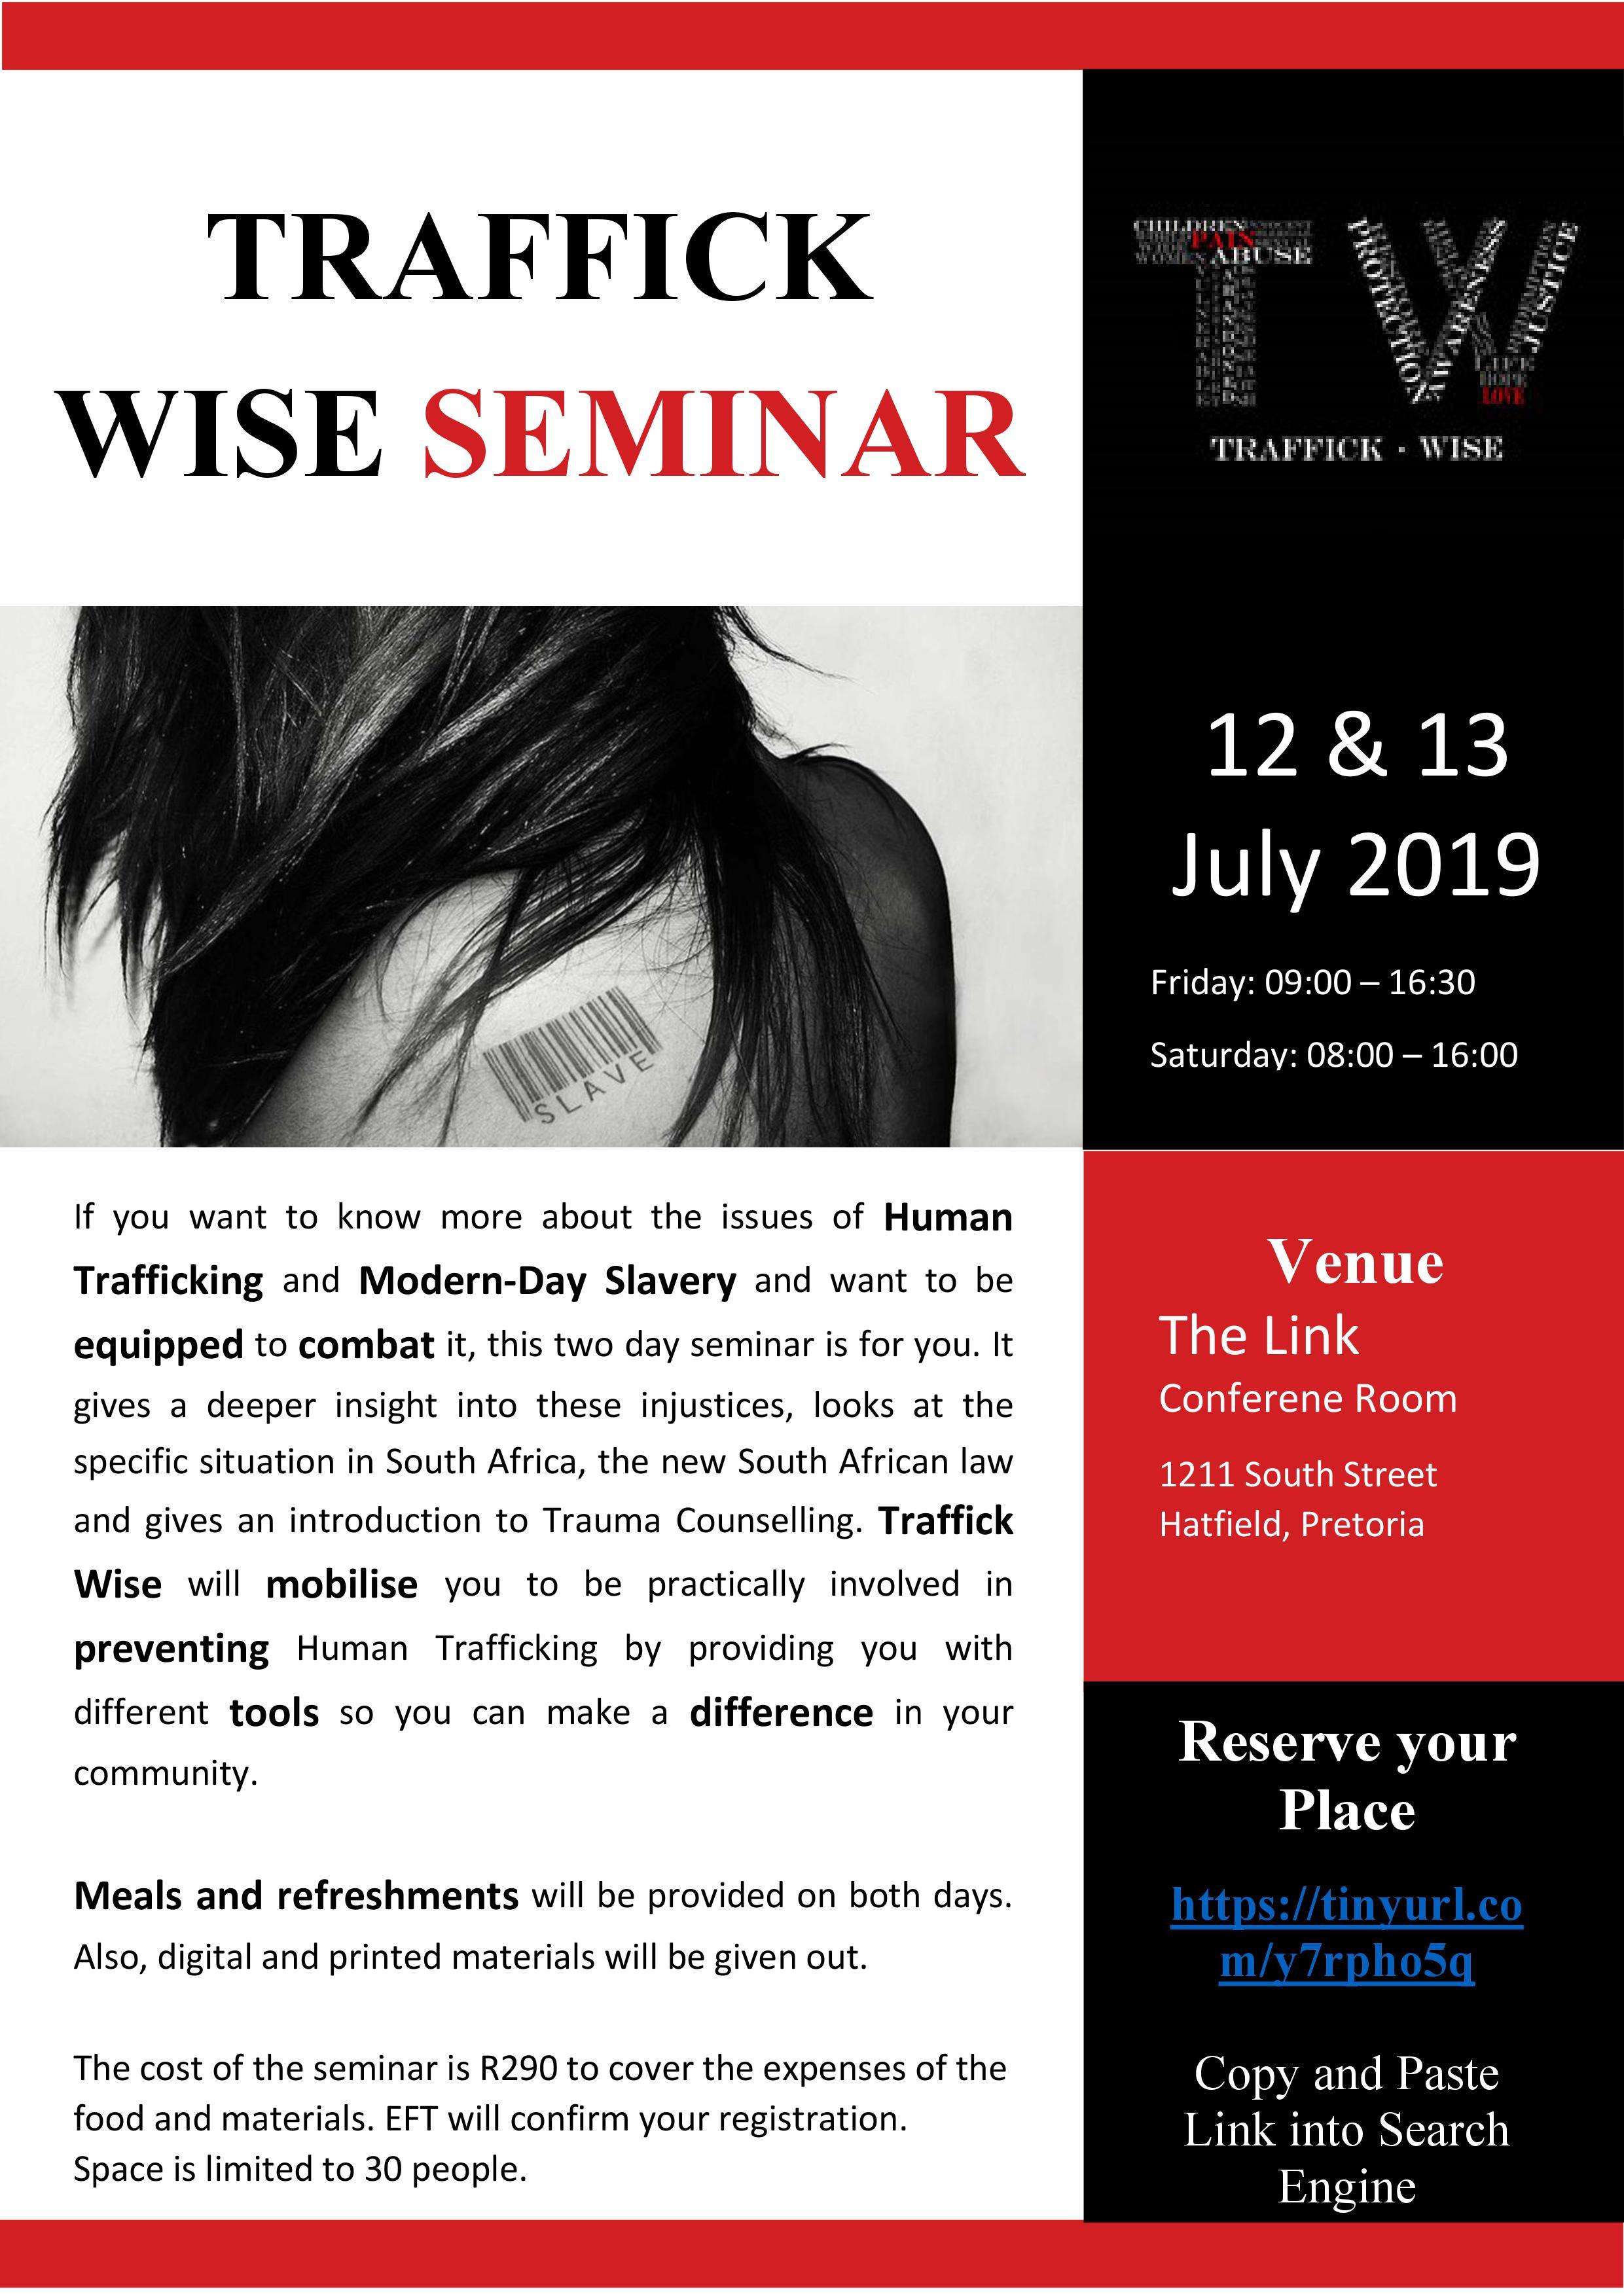 Traffick Wise seminar 12 - 13 July 2019